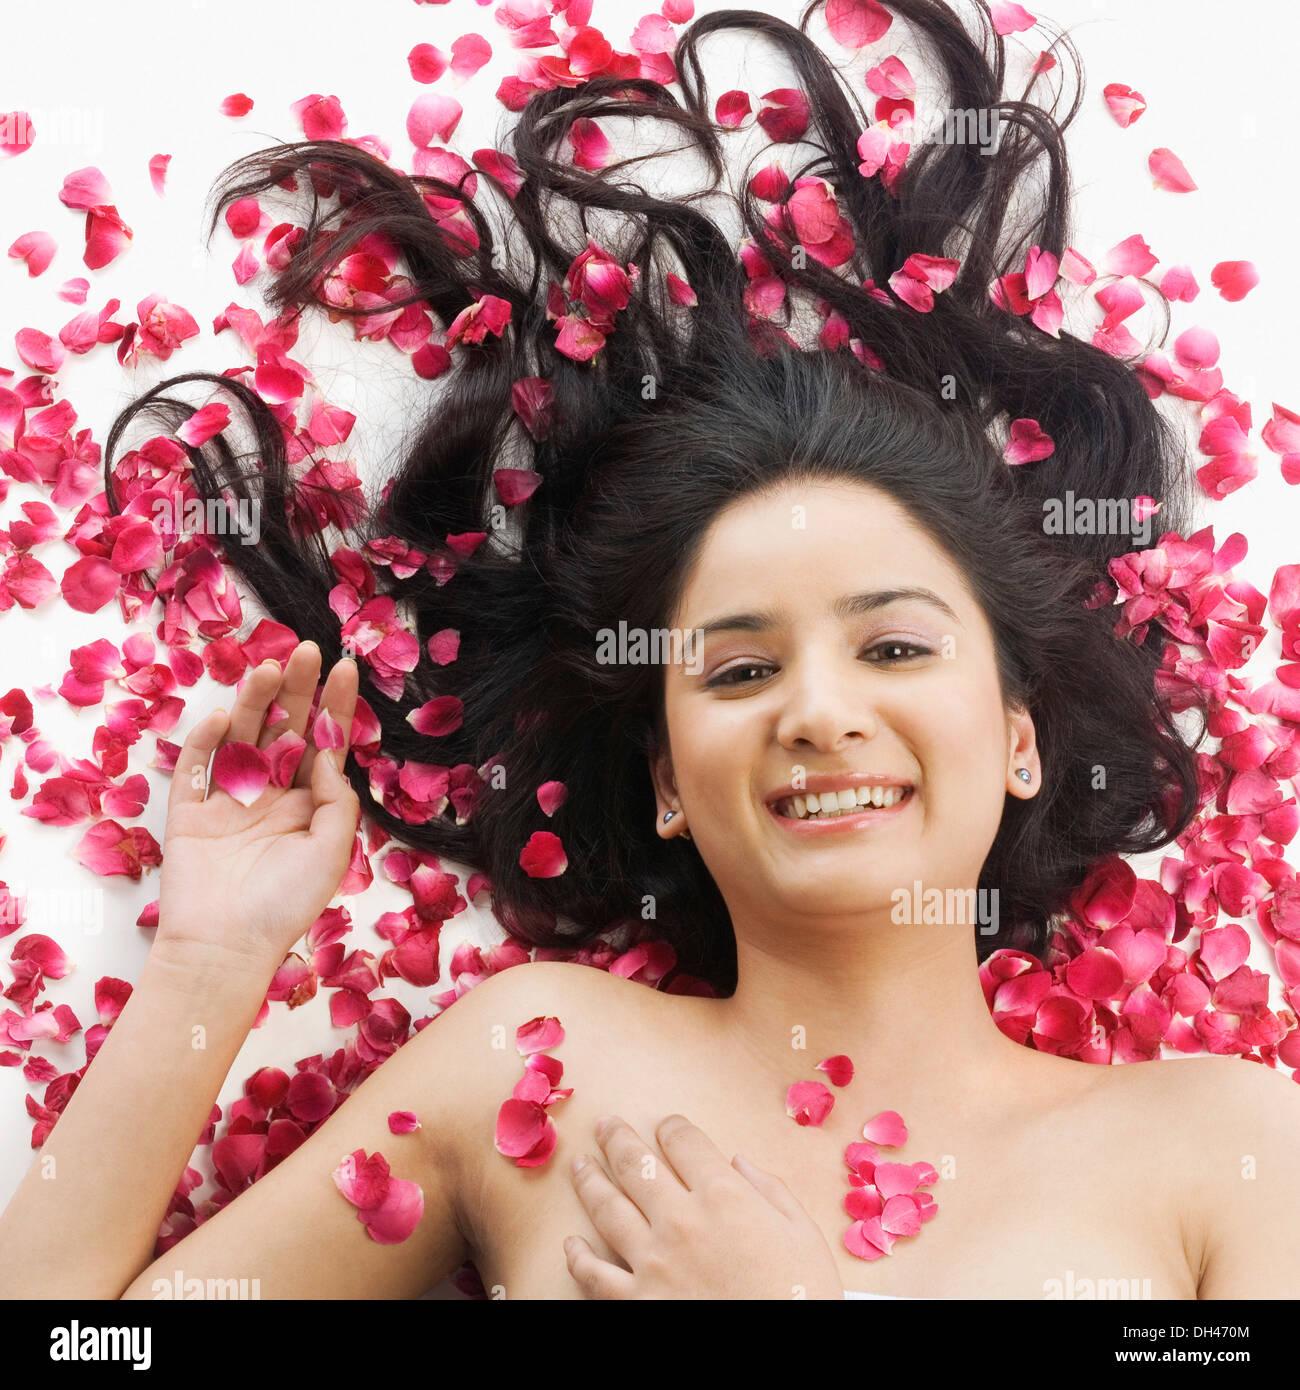 Frau liegt auf Rosenblättern Stockfoto